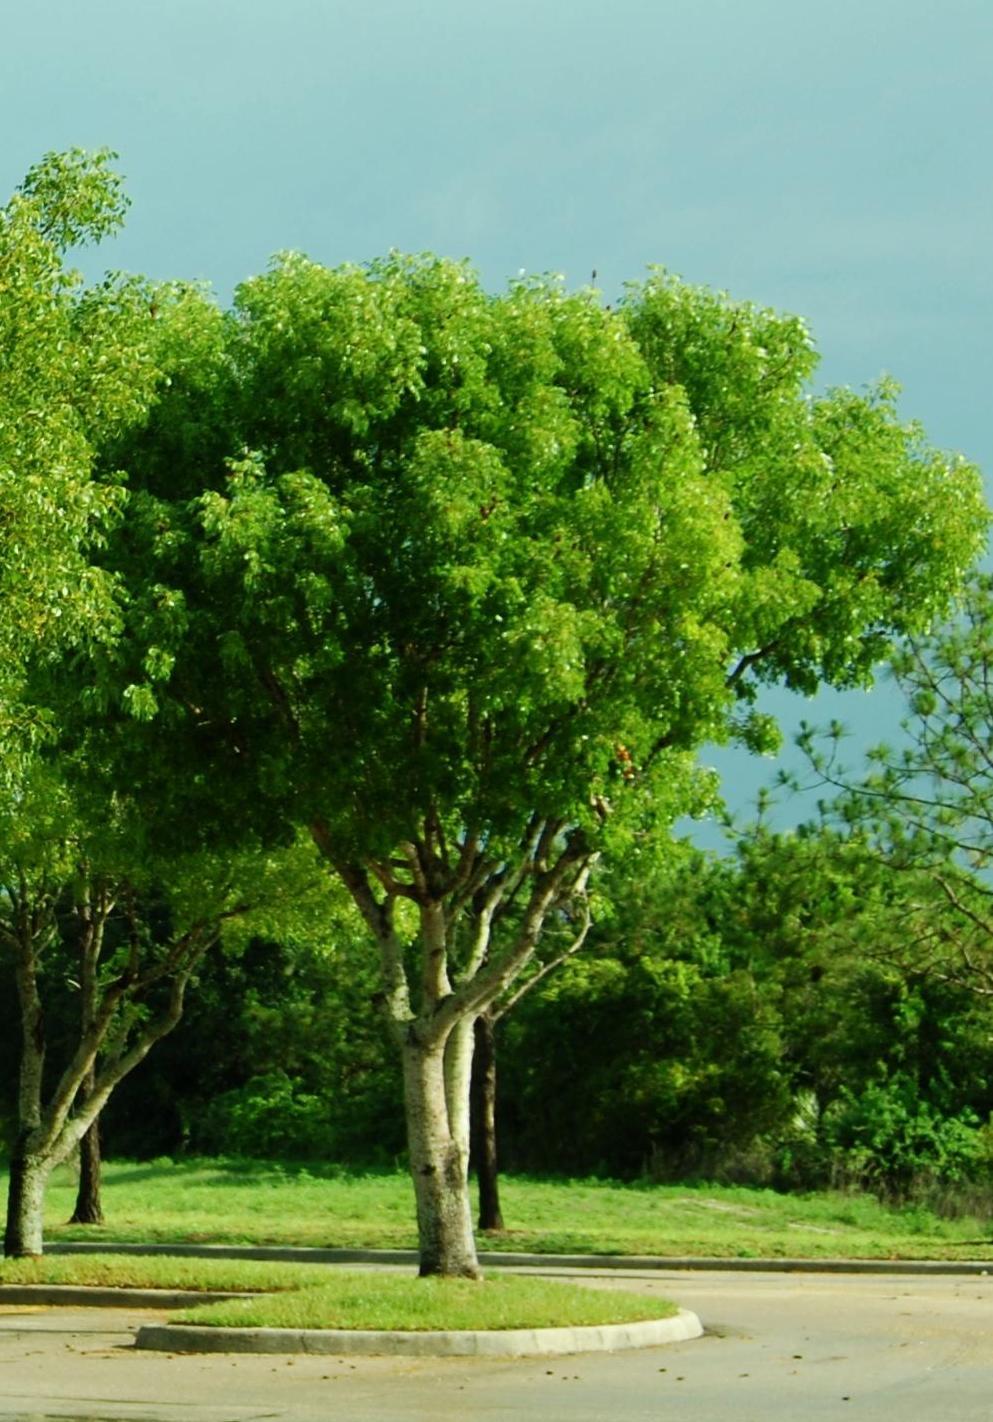 JAMAICA I SAID IT: JAMAICA TREES